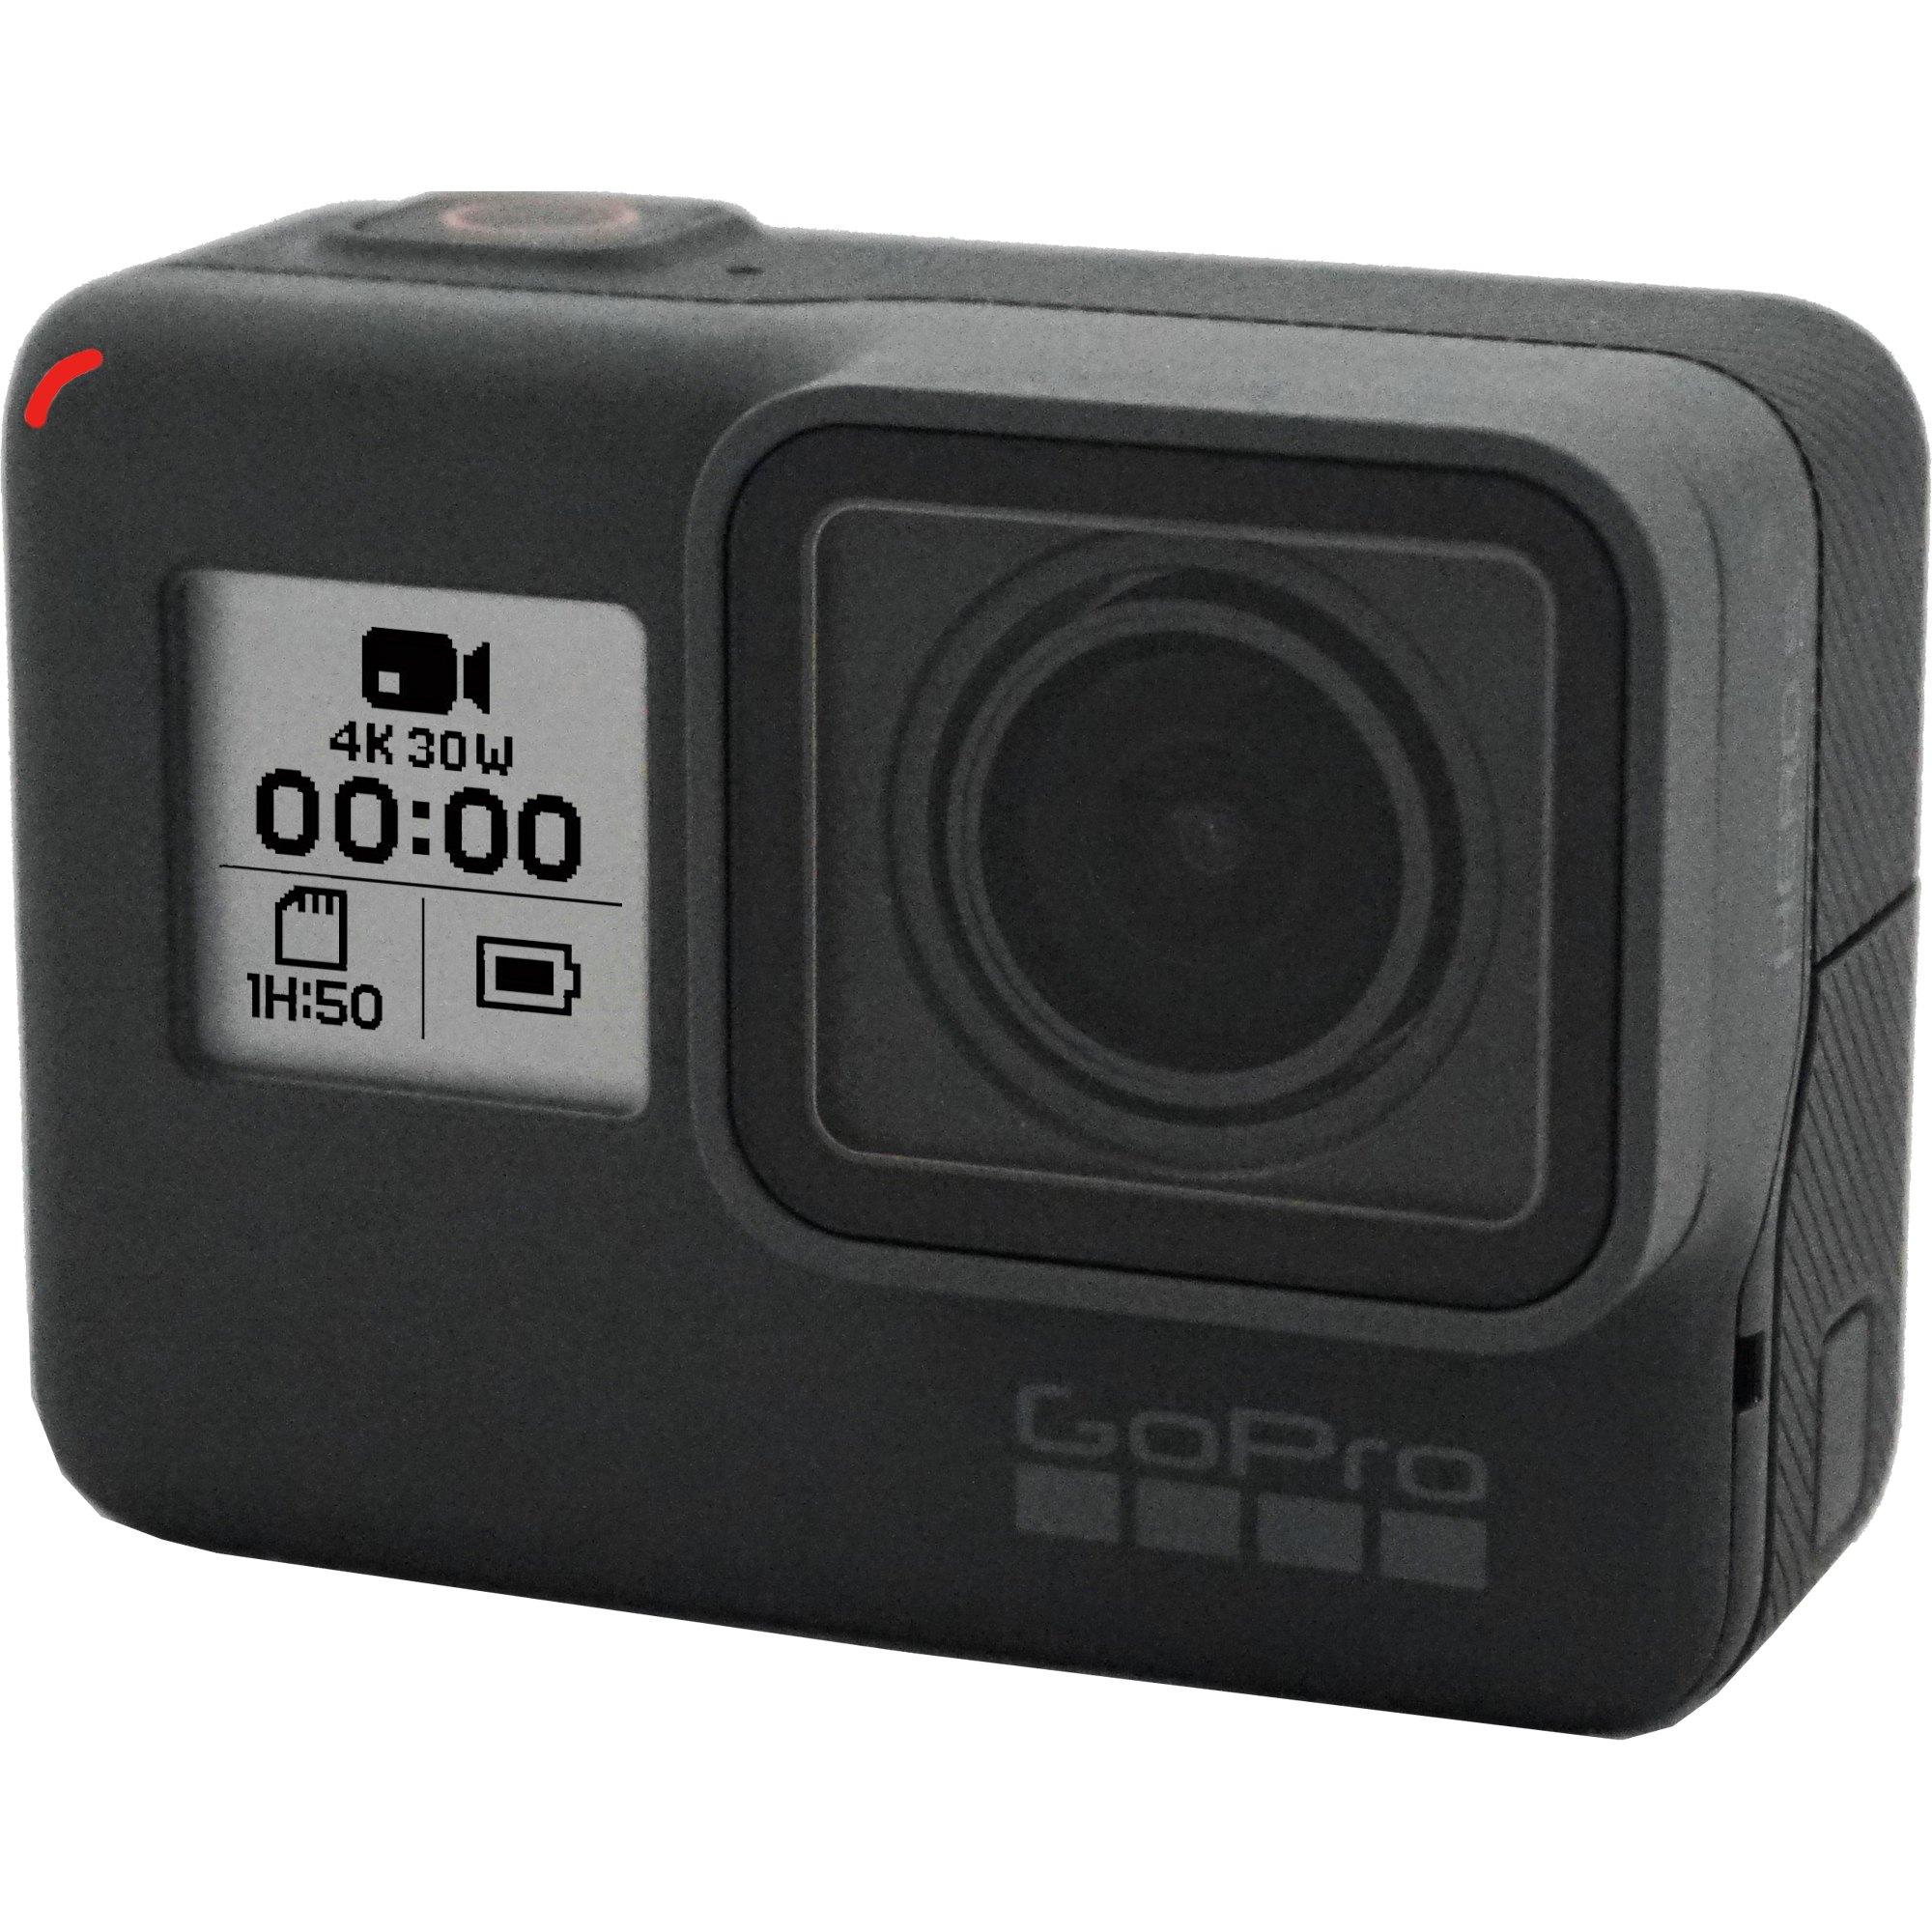 GoPro HERO5 Black Waterproof 4K Action Camera for $250 + Free Shipping